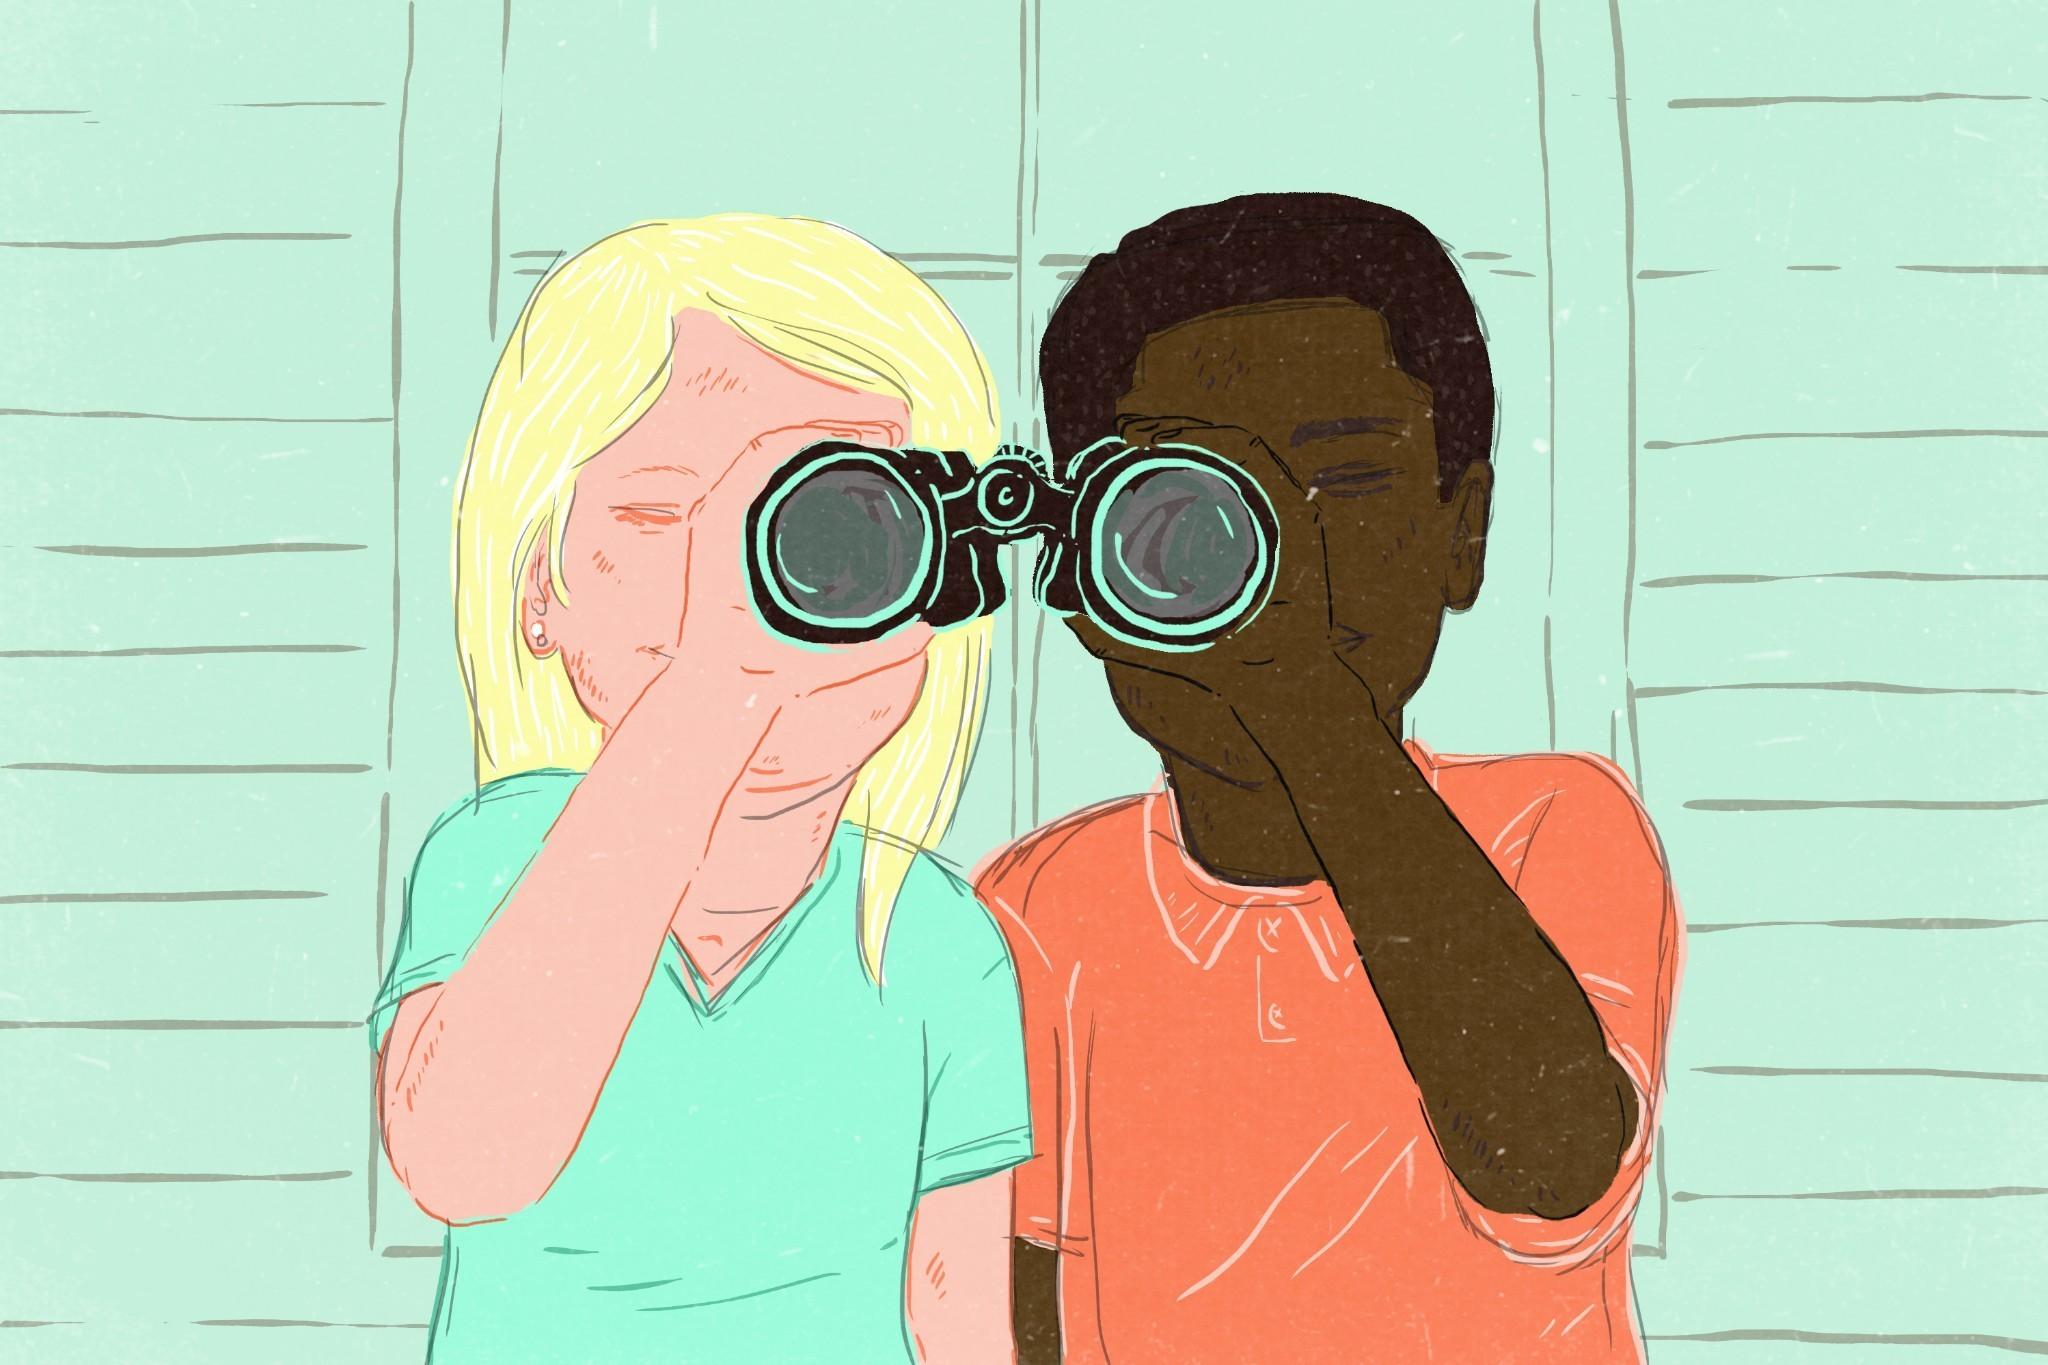 Beyond Integration: How Teachers Can Encourage Cross-Racial Friendships